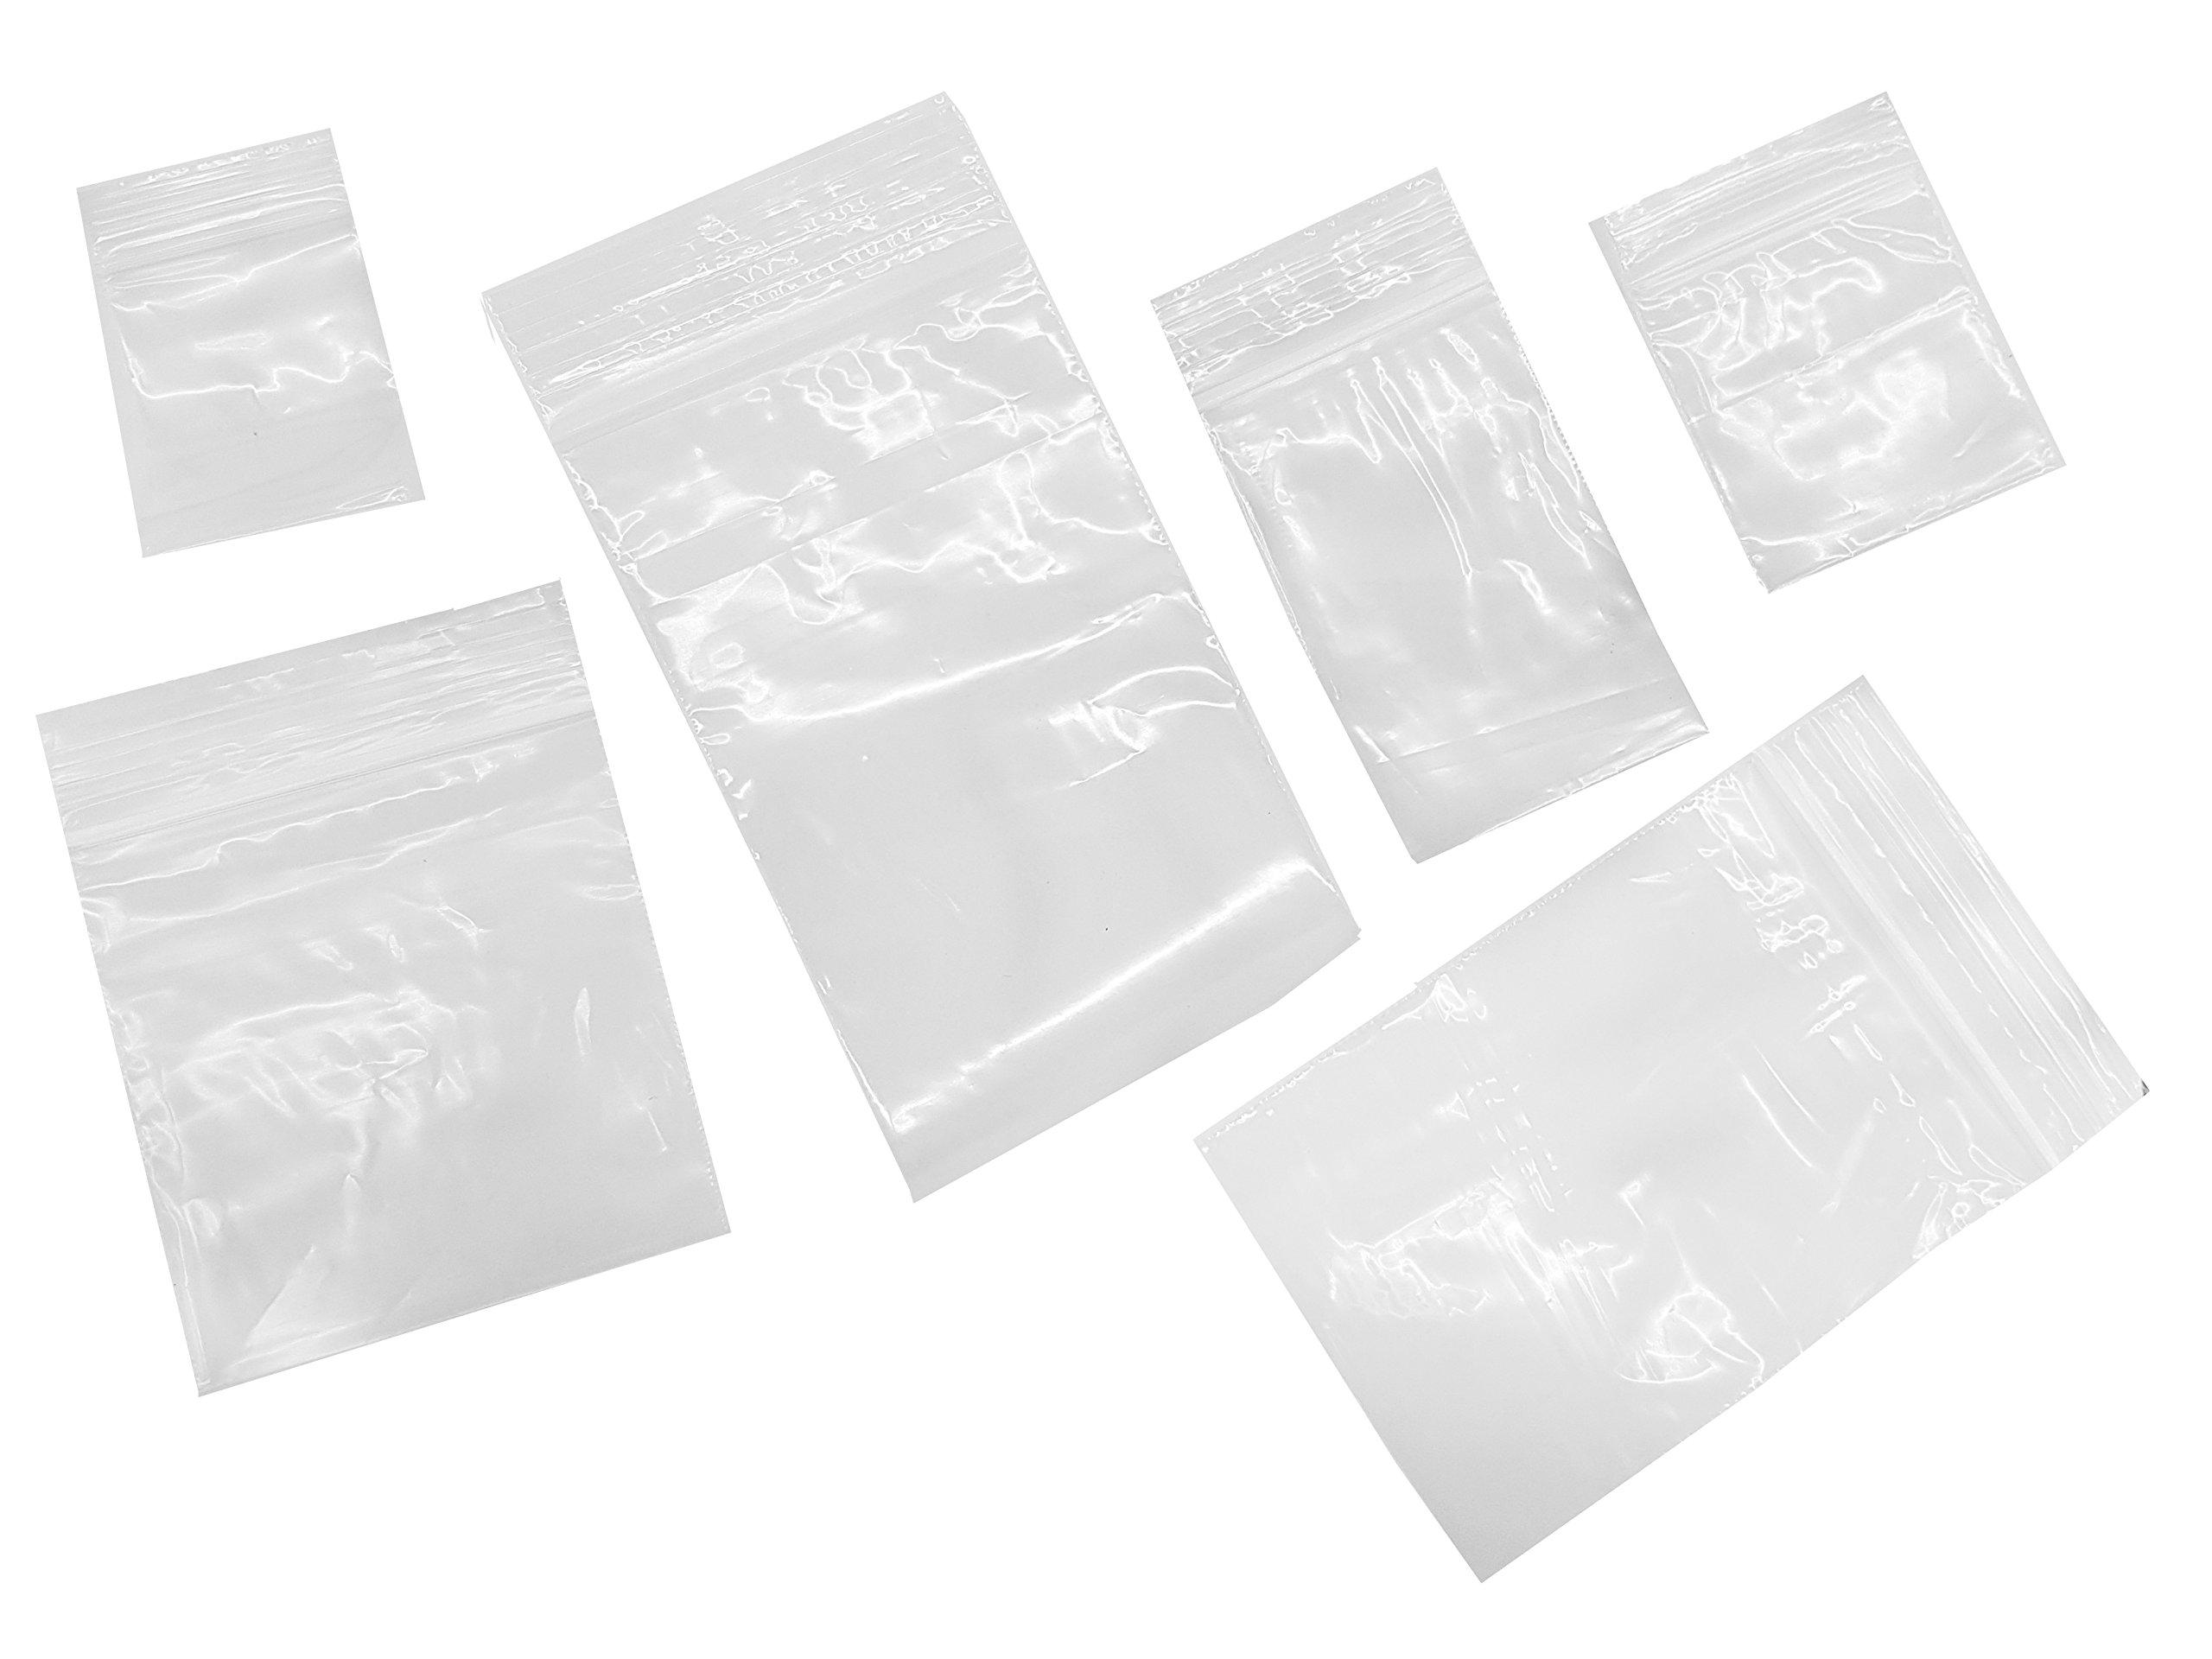 Plastic Bags Clear Ziplock Bags 7 Sizes 100 Pieces of Each Size 3.5x5 3.5x5 4x6 5x7 6x9 7x10 8x12cm Total 700 Pieces